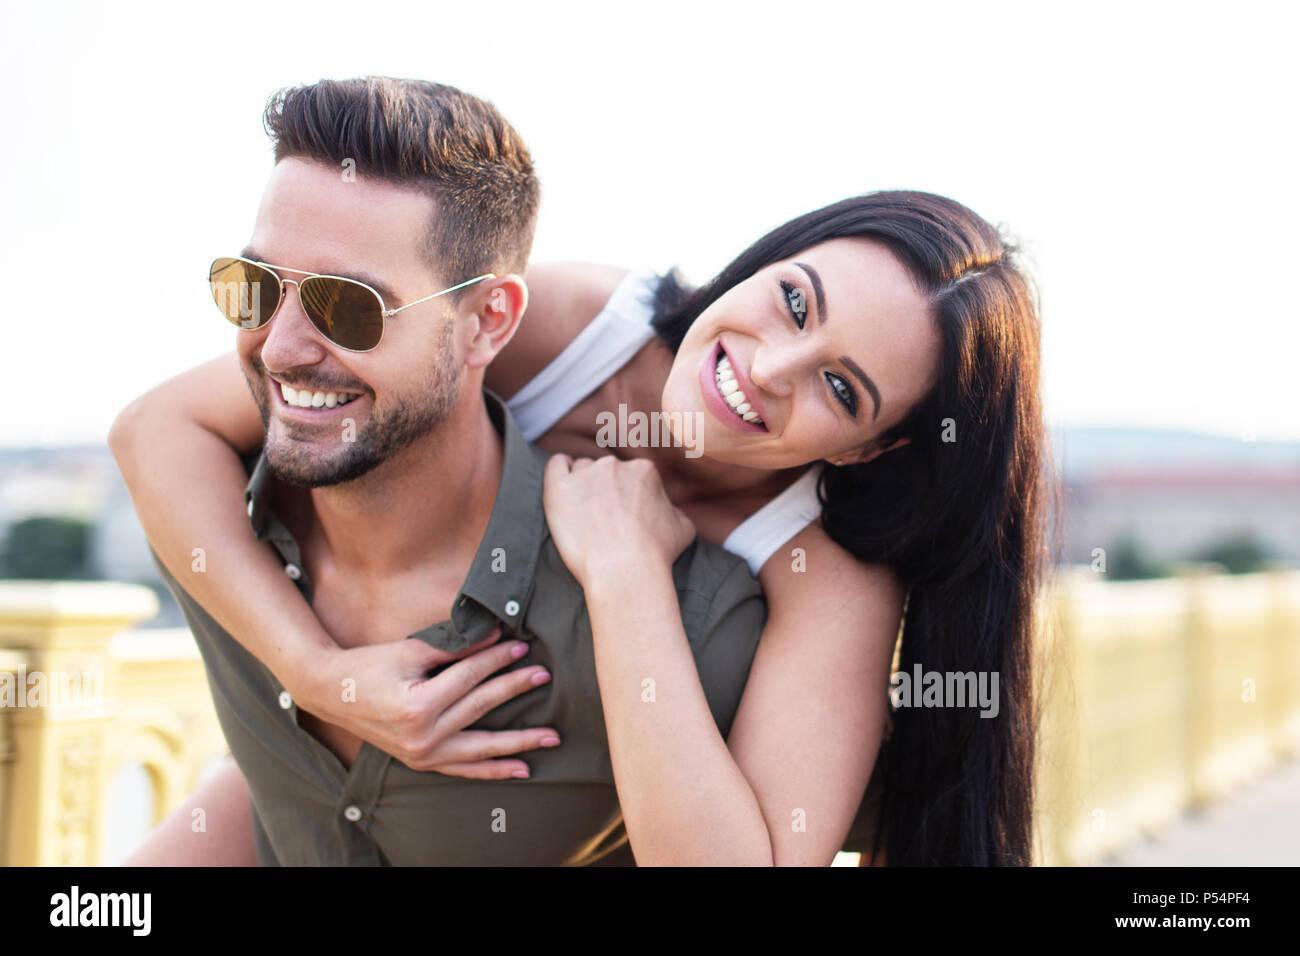 Feliz pareja joven divertirse al aire libre, piggyback, amor Imagen De Stock